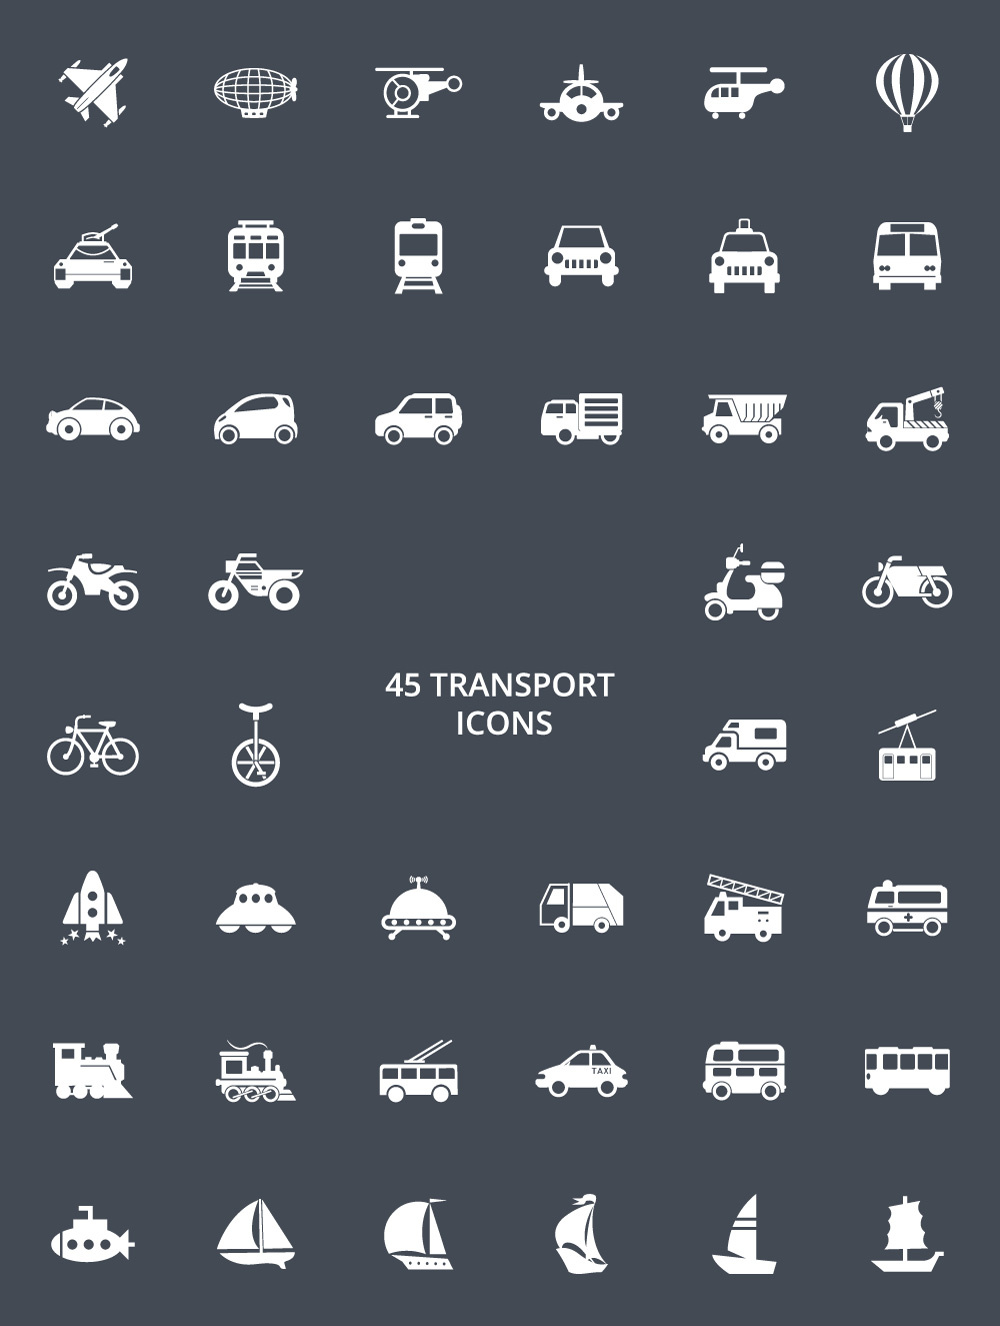 free-transport-icons-no-bg